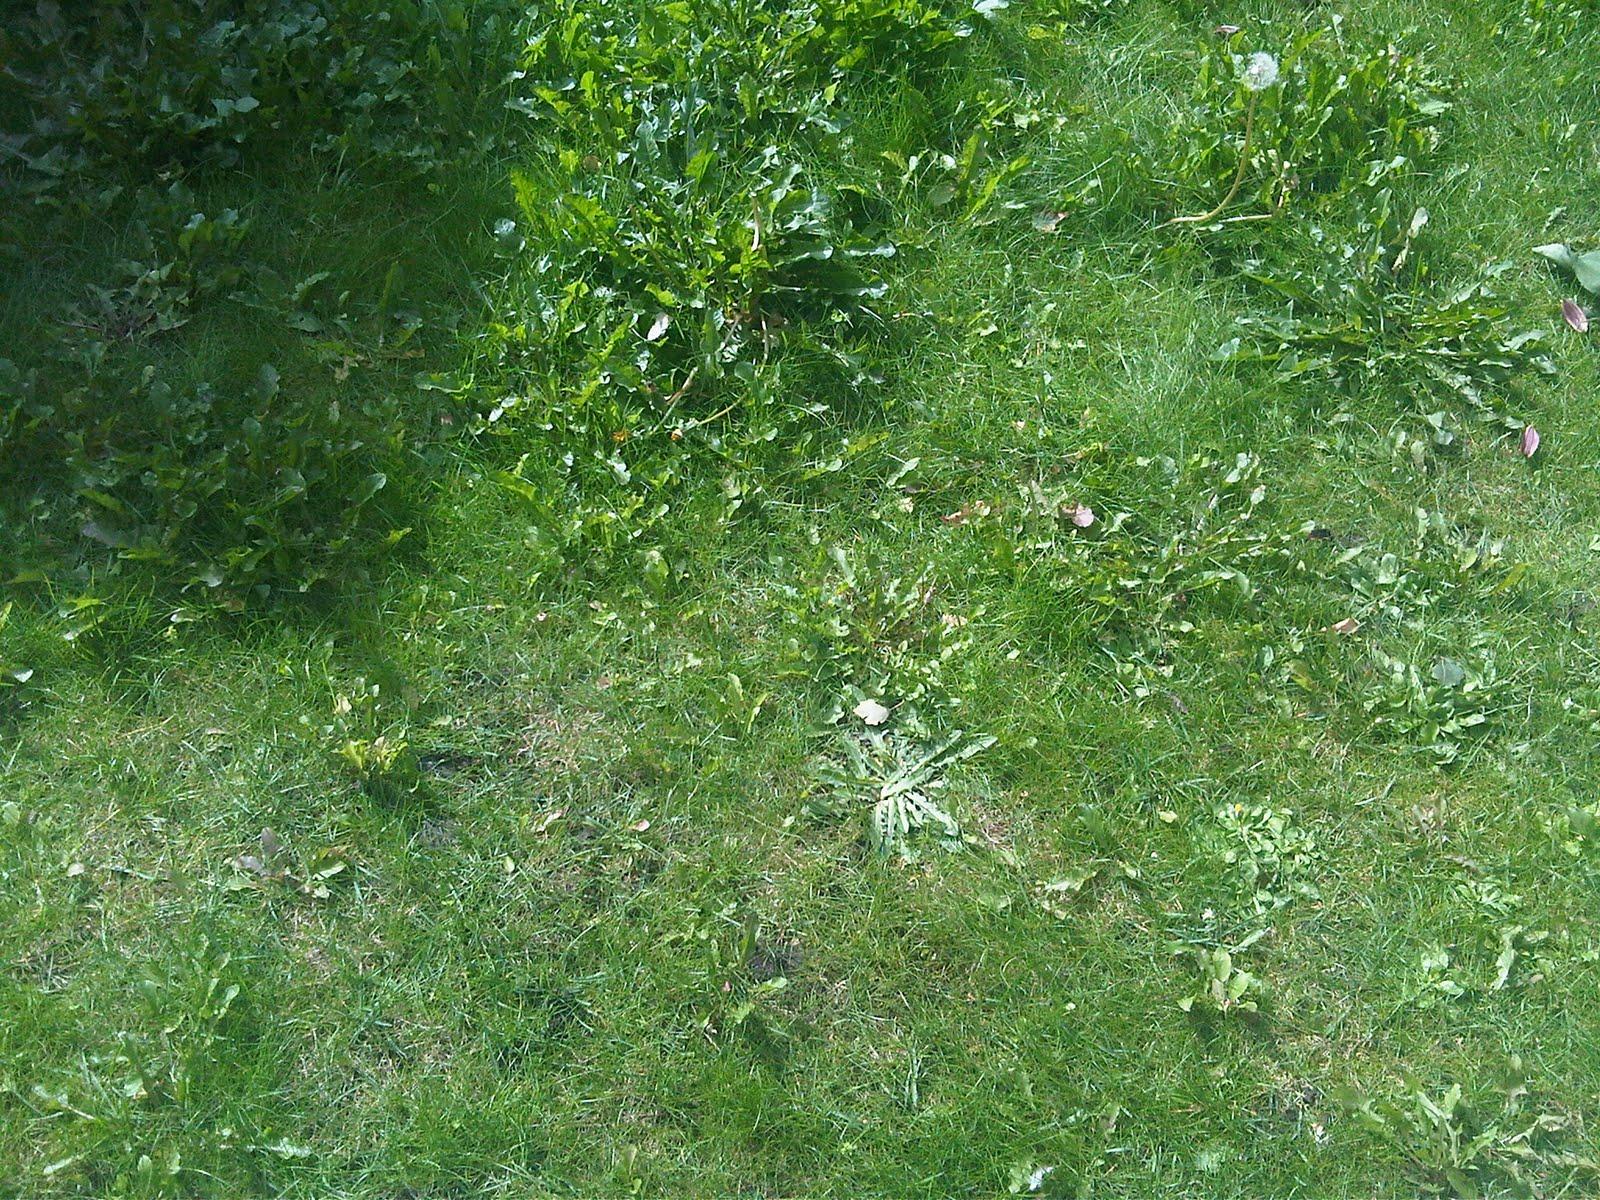 http://3.bp.blogspot.com/_pJSb5eUG4Is/THjv0fW7jeI/AAAAAAAABp8/EZZ6Z-BcI3U/s1600/grass.jpg